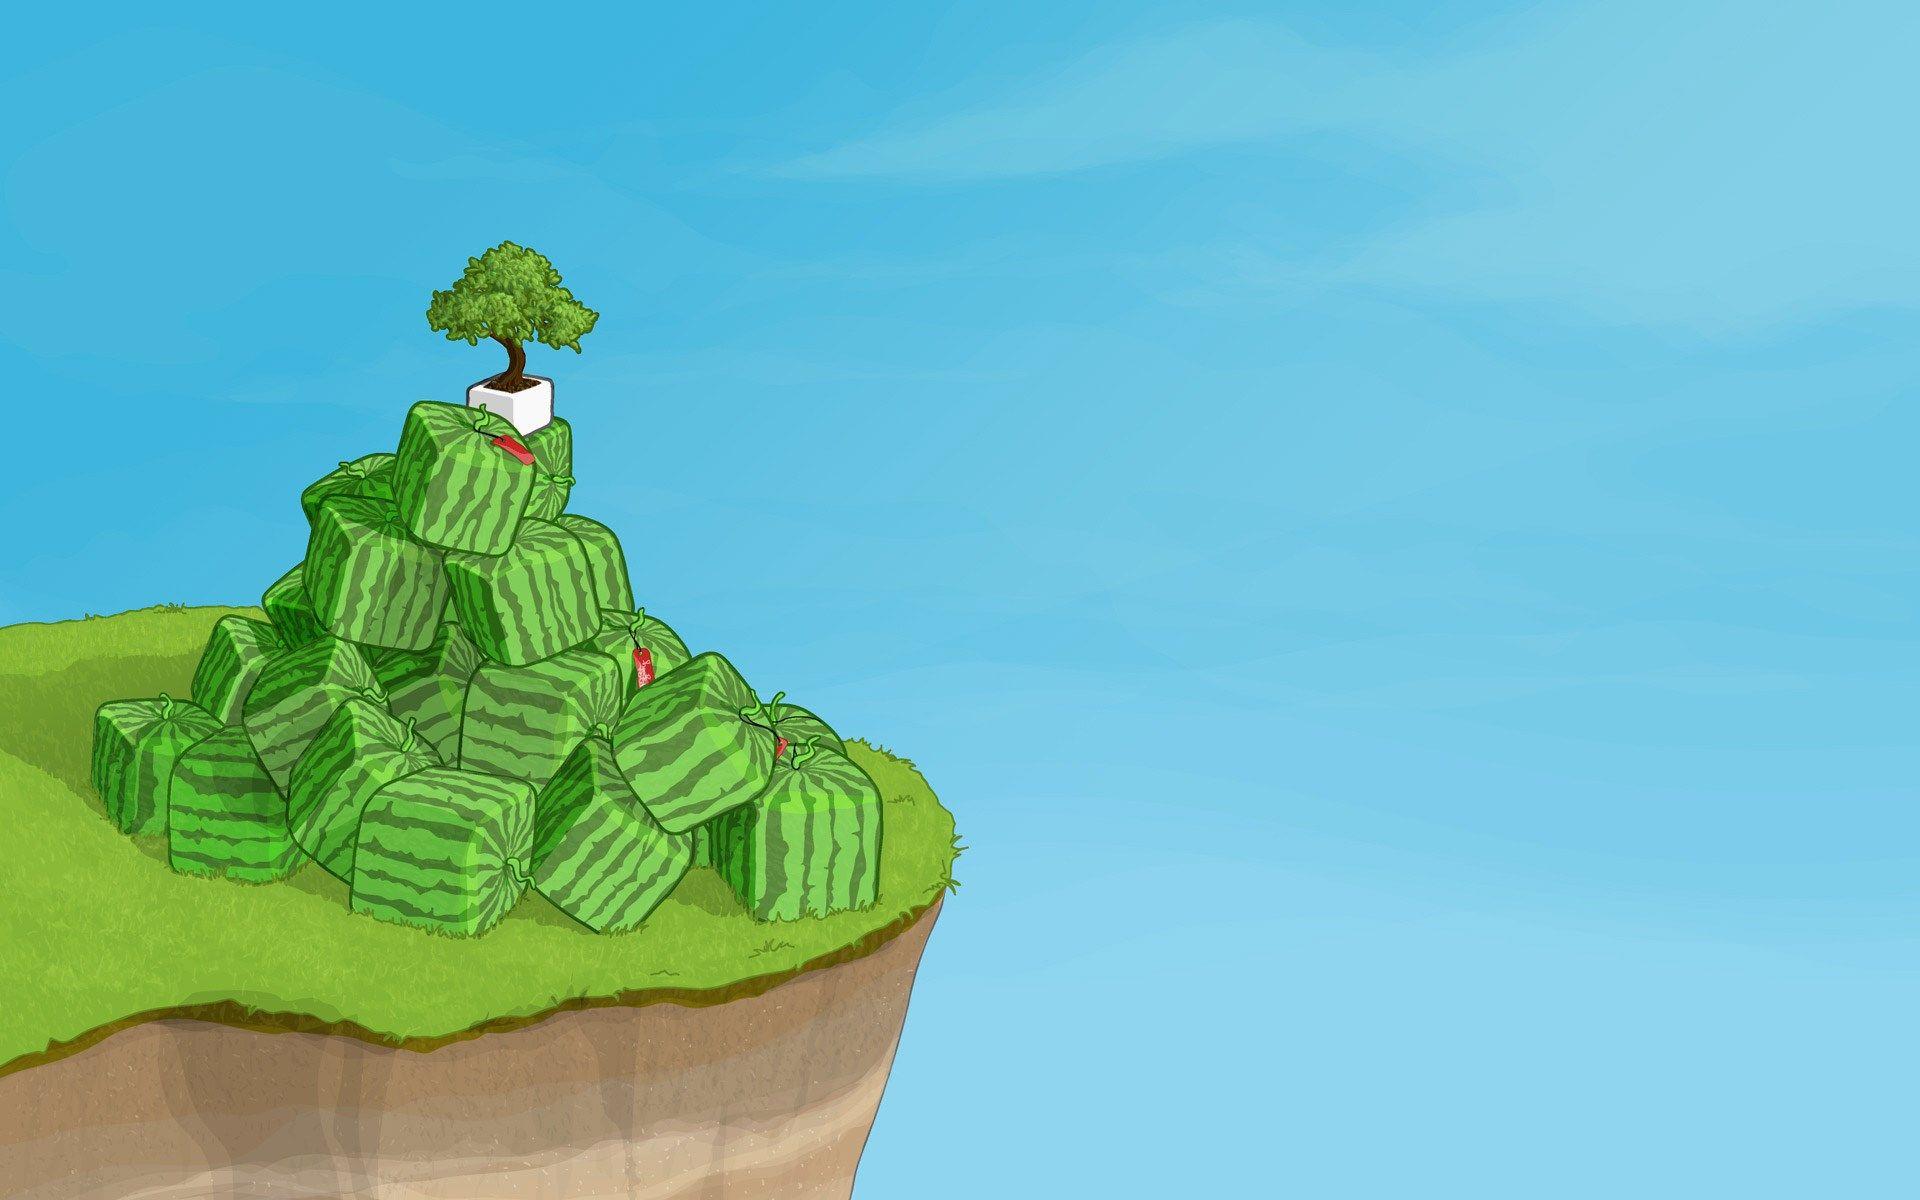 Top Wallpaper Minecraft Square - 86df69befded8a8d432f0ea411b8087e  Image_83641.jpg